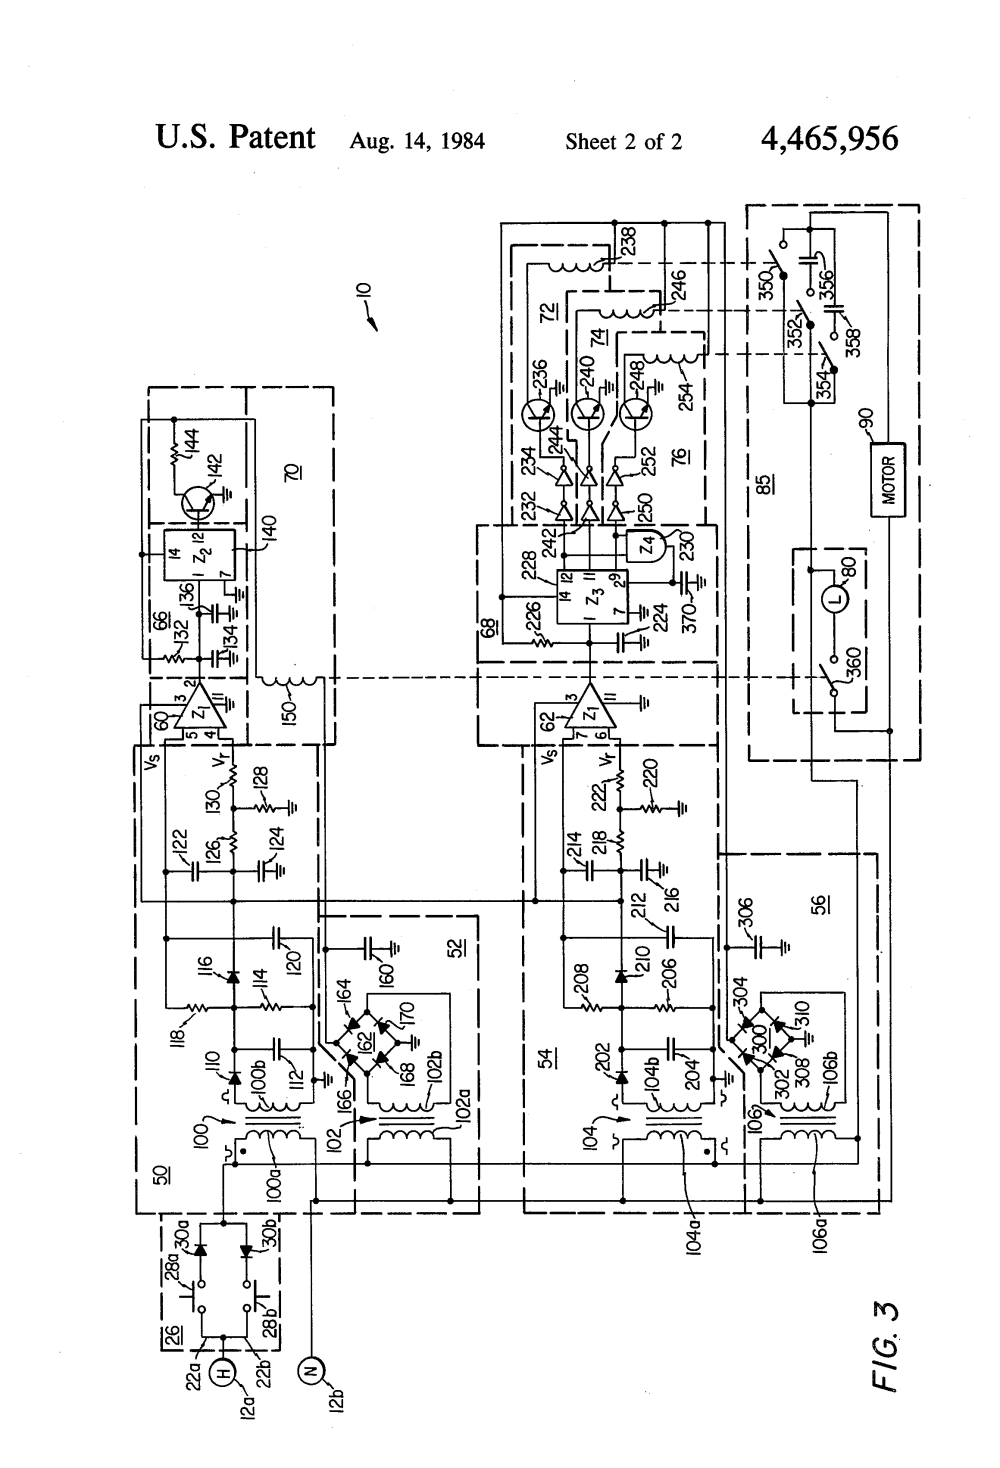 medium resolution of kone crane wiring diagram wiring diagram kone crane wiring diagram